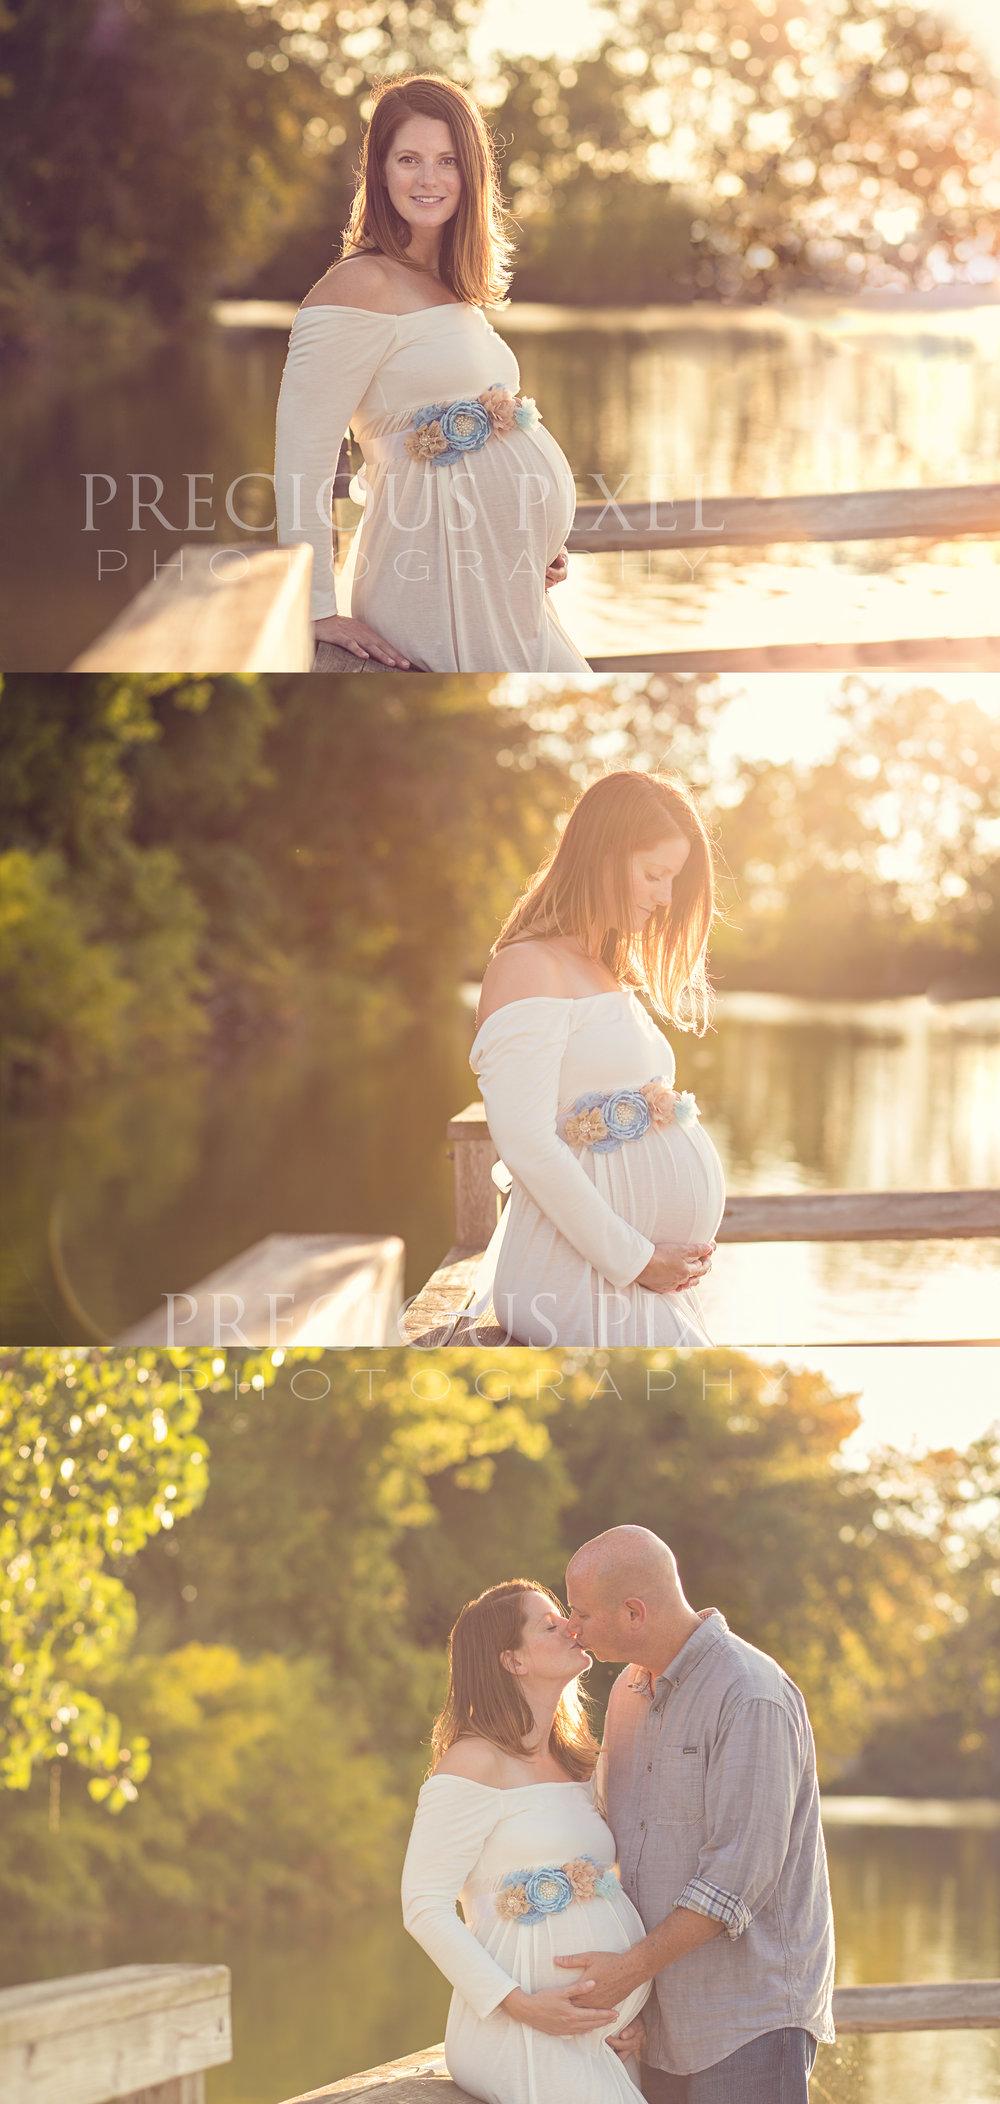 Maternity Photography, Beach, Fall, Precious Pixel Photography, Southeast MI maternity photographer, Newborn, baby bump pics,